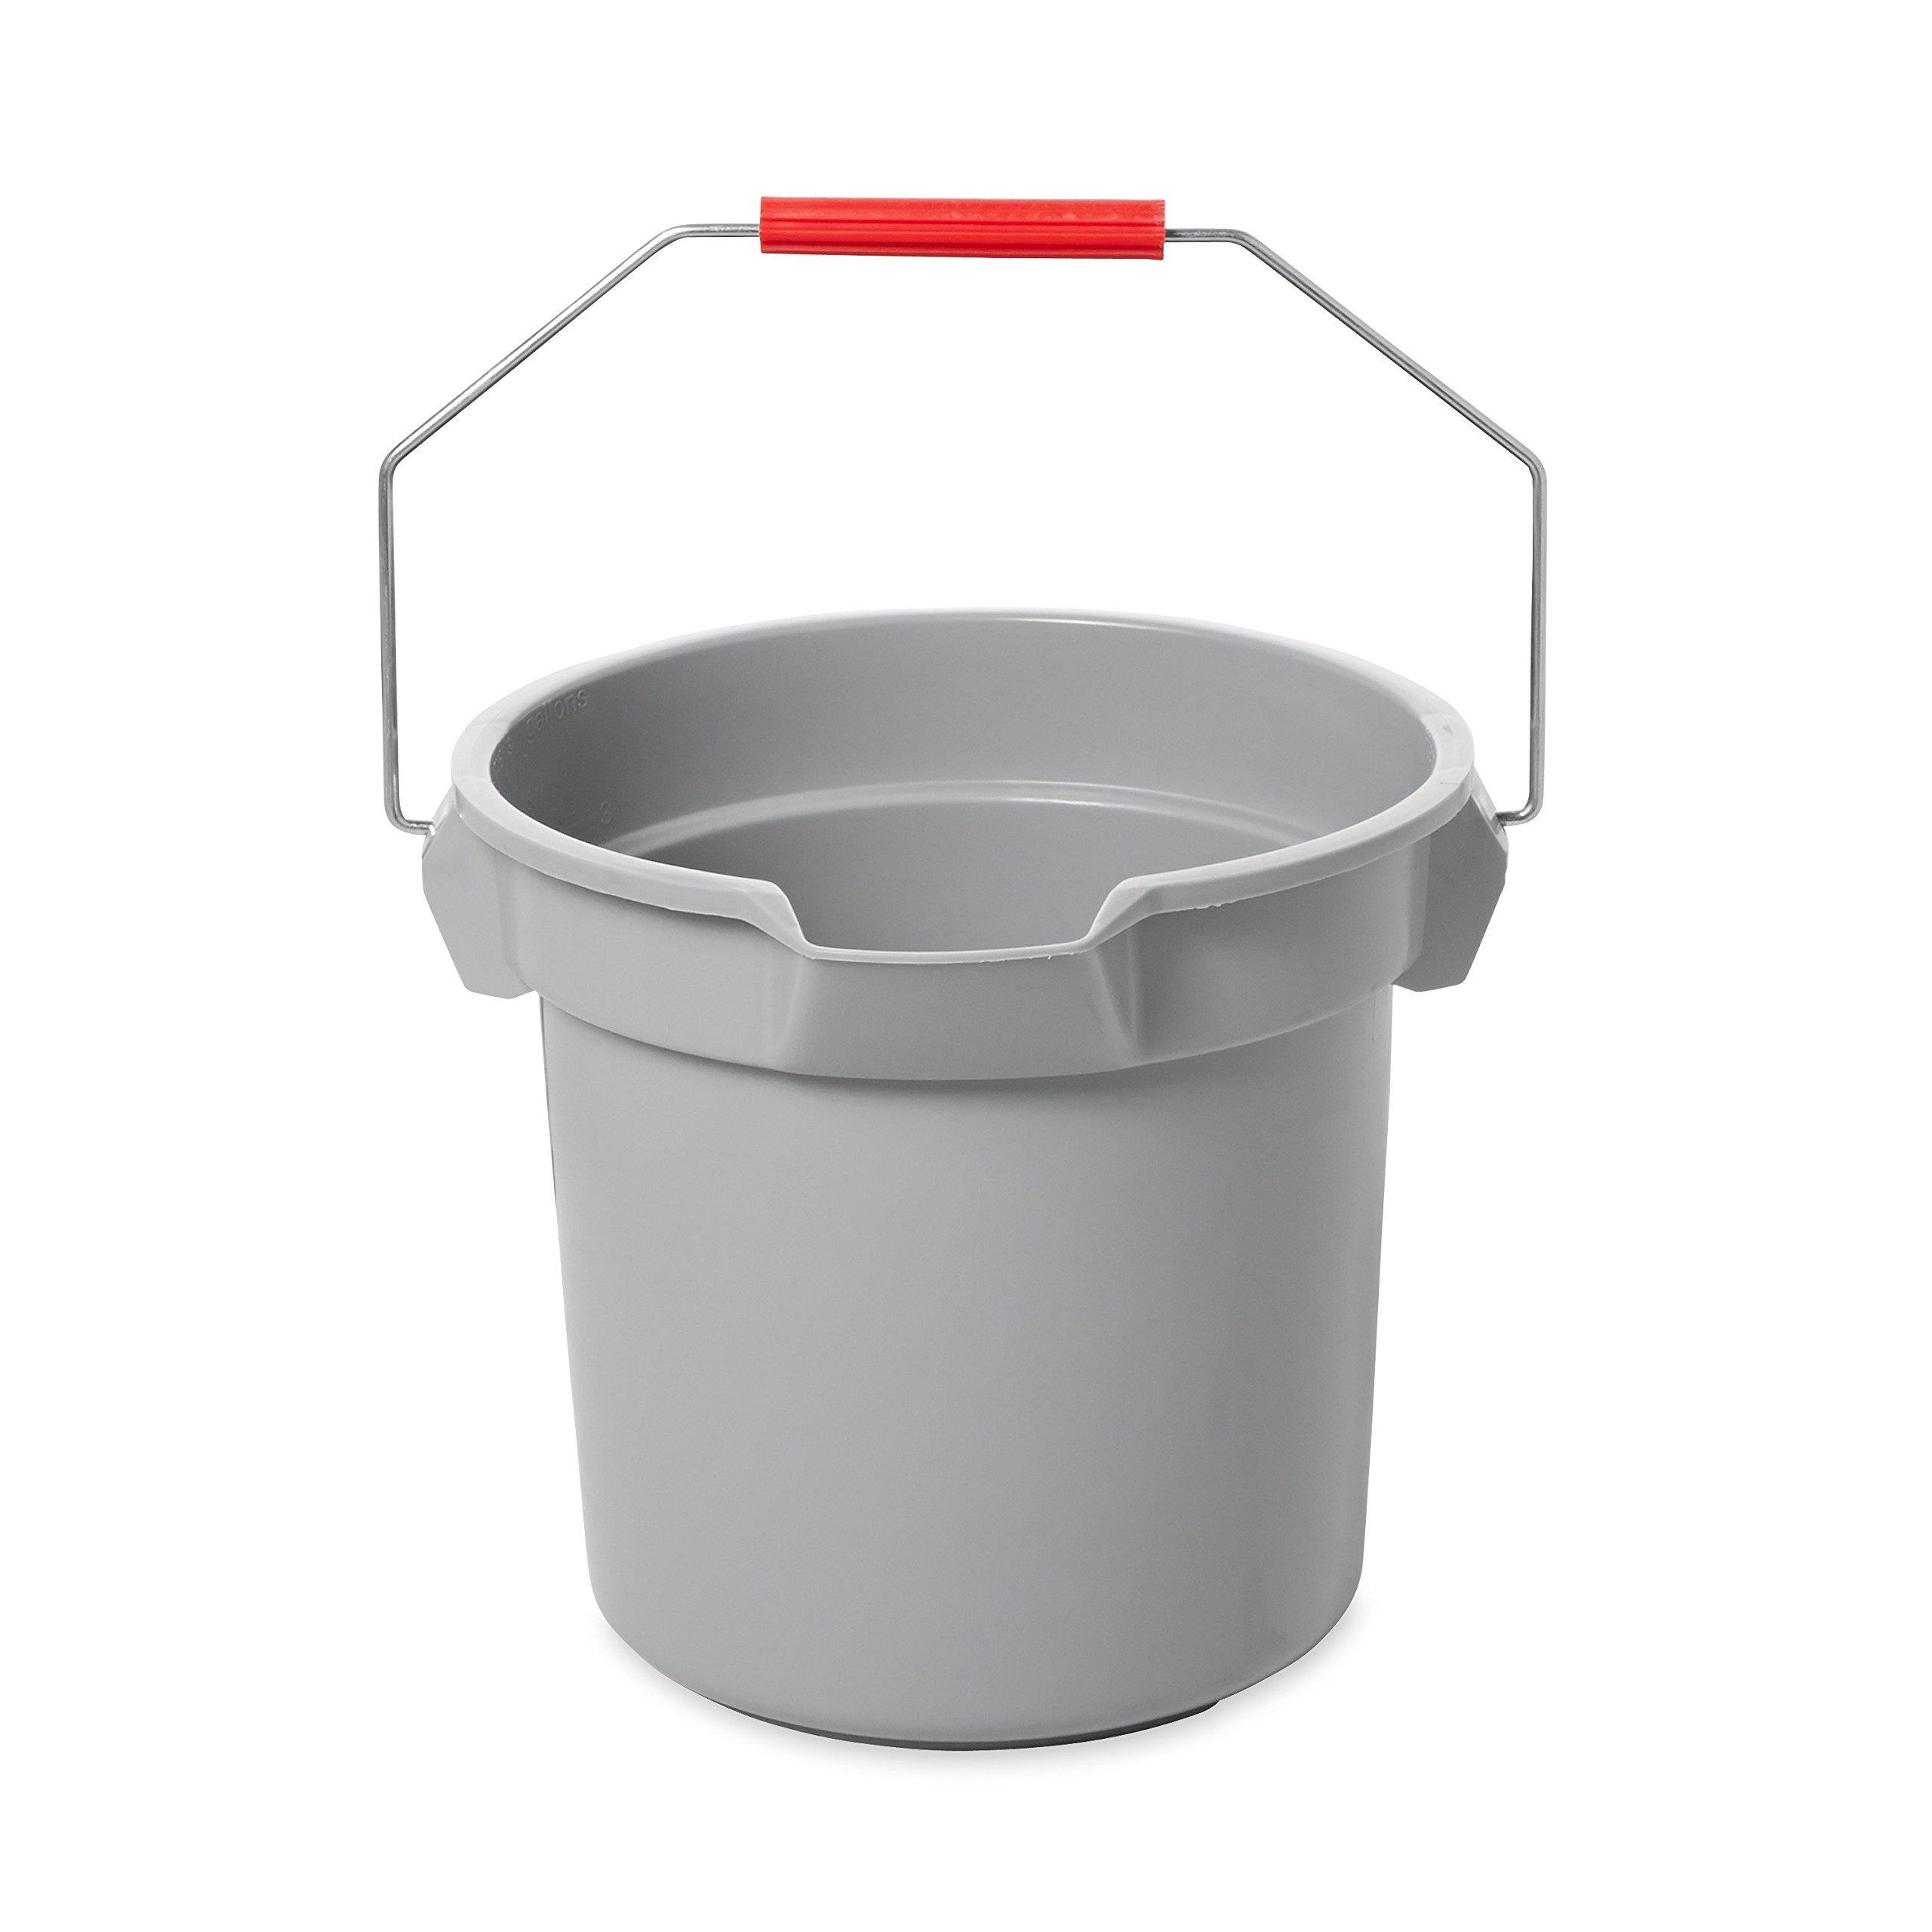 Rubbermaid Commercial BRUTE Bucket, 14-Quart, Gray